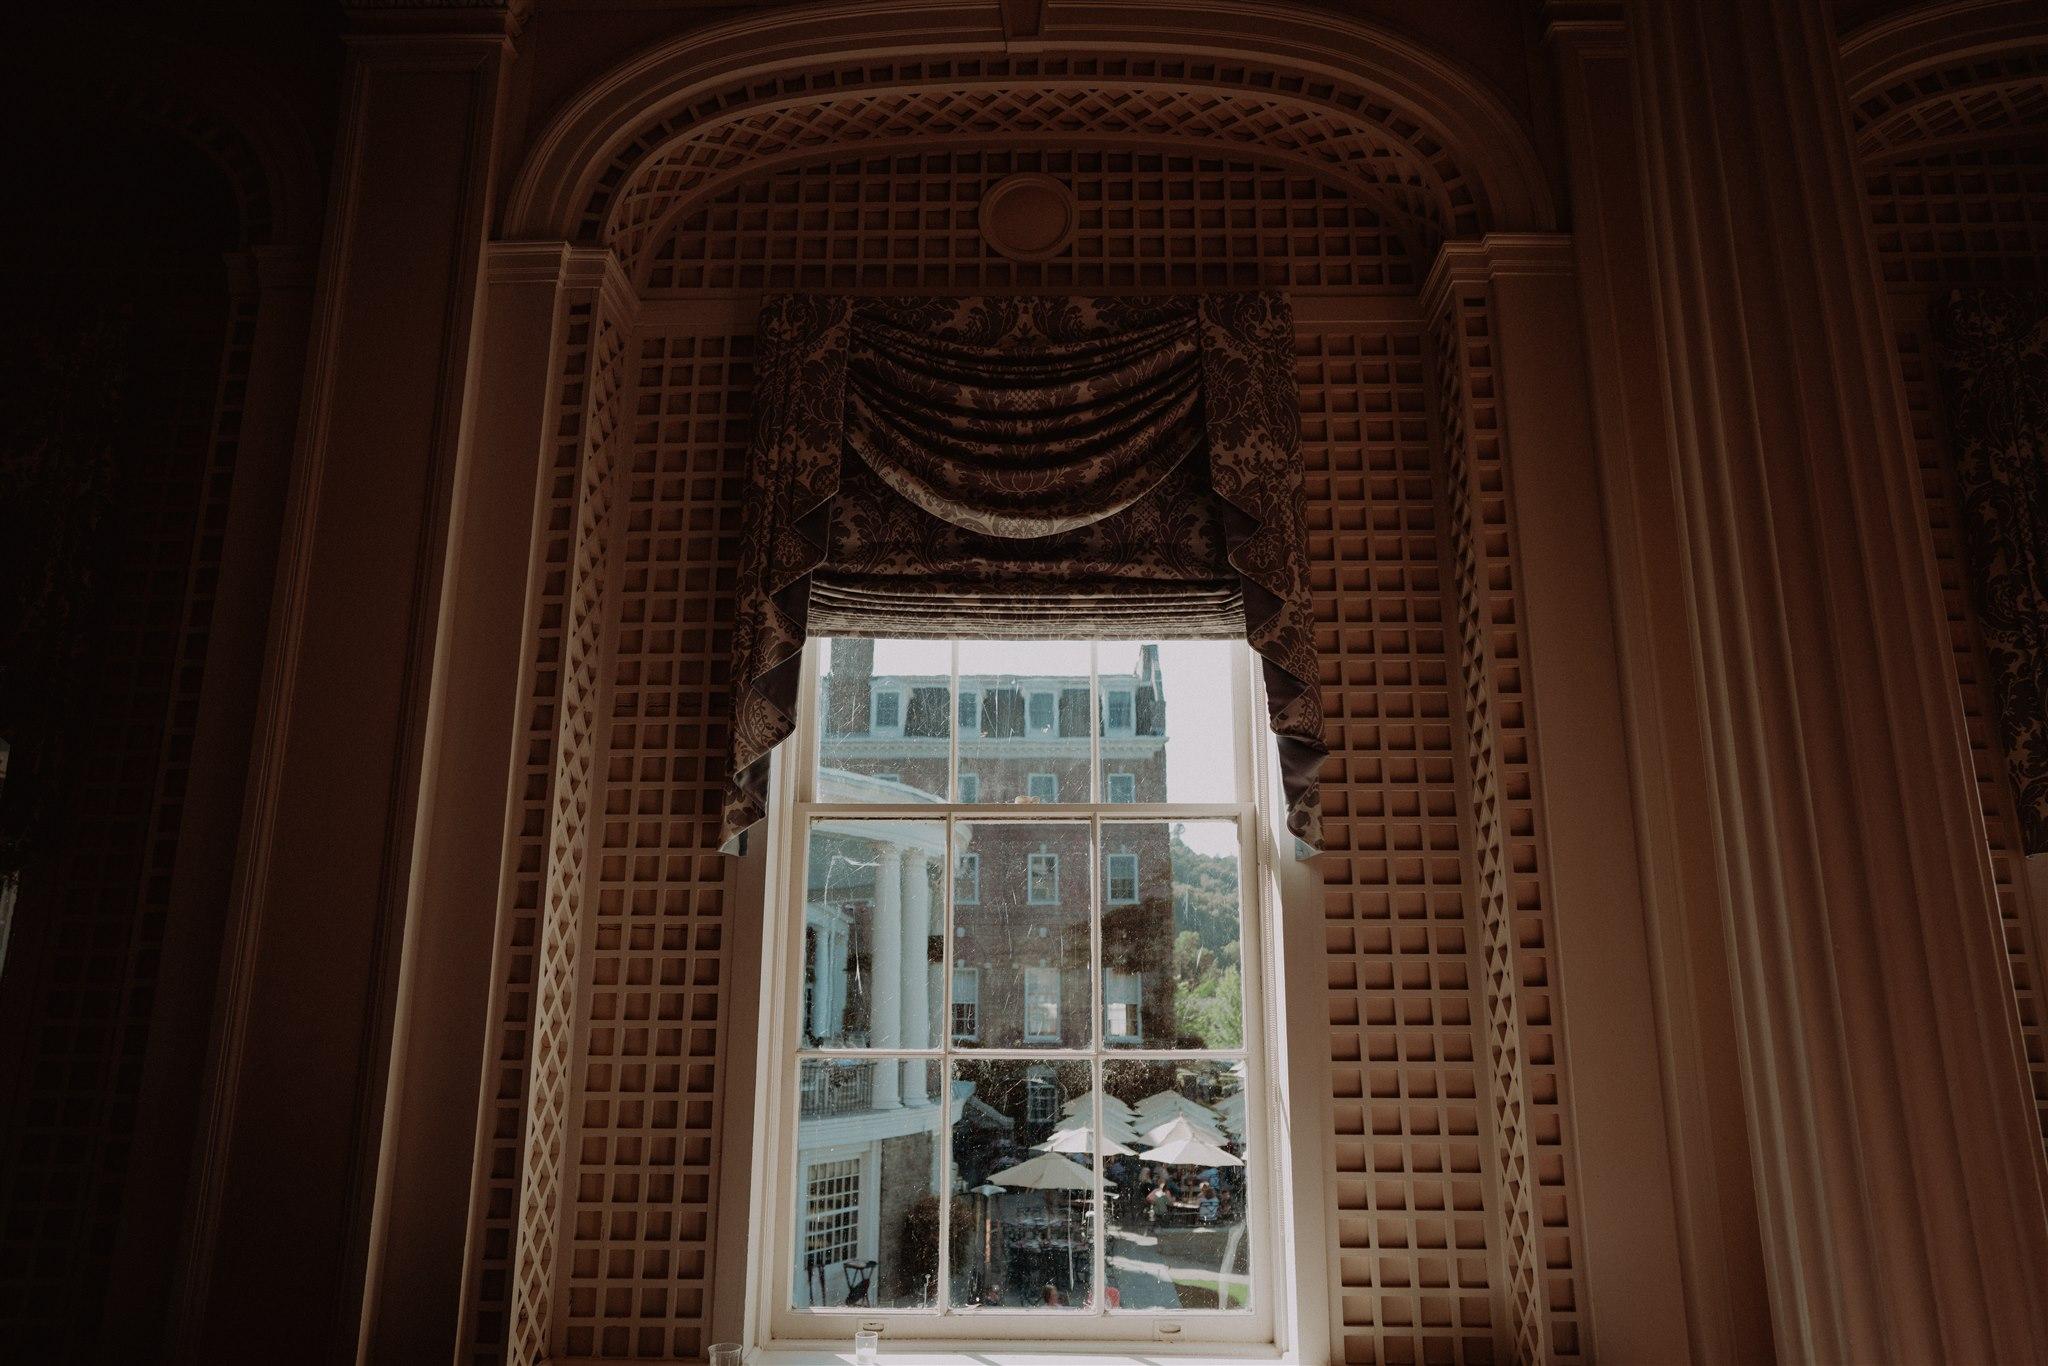 Chellise_Michael_Photography_Hudson_Valley_Wedding_Photographer_Otesaga_Hotel-4086.jpg